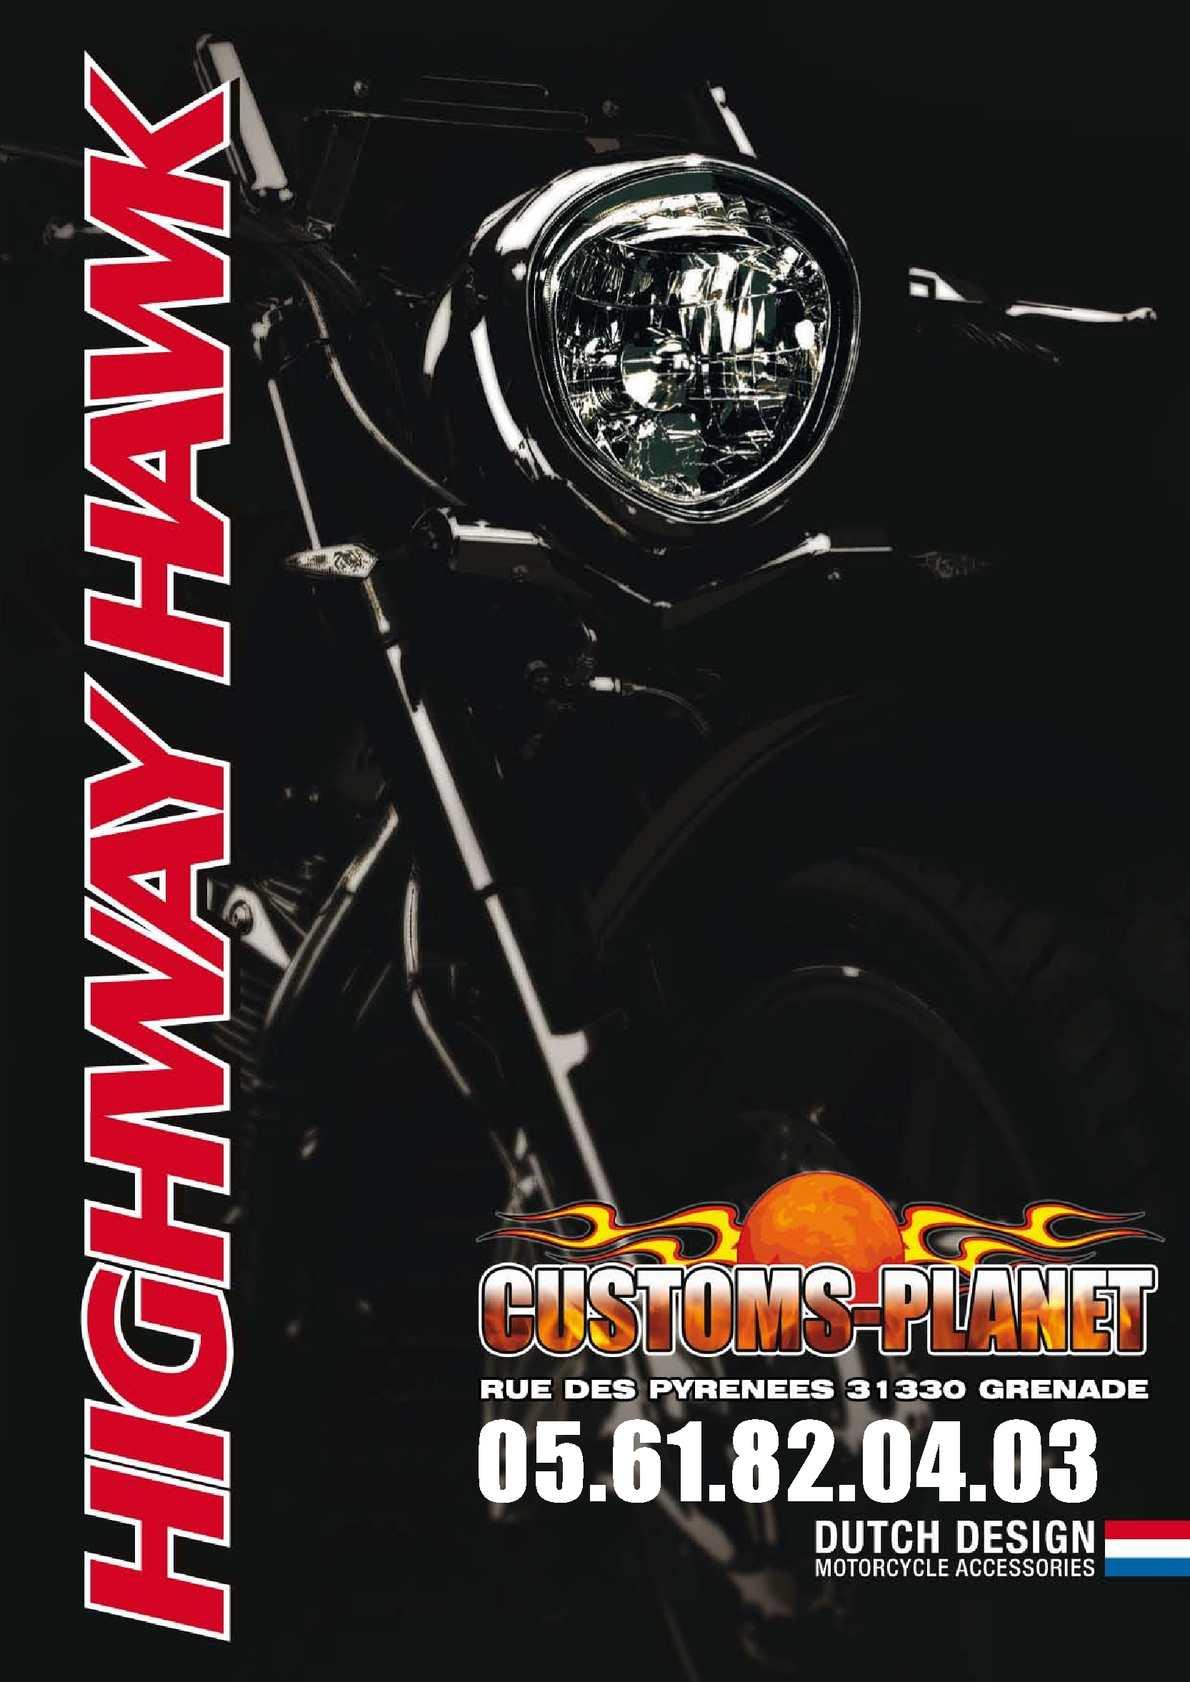 ADESIVI DECAL STICKERS SKULL CHROME HARLEY DAVIDSON X SERBATOIO MOTO CUSTOM